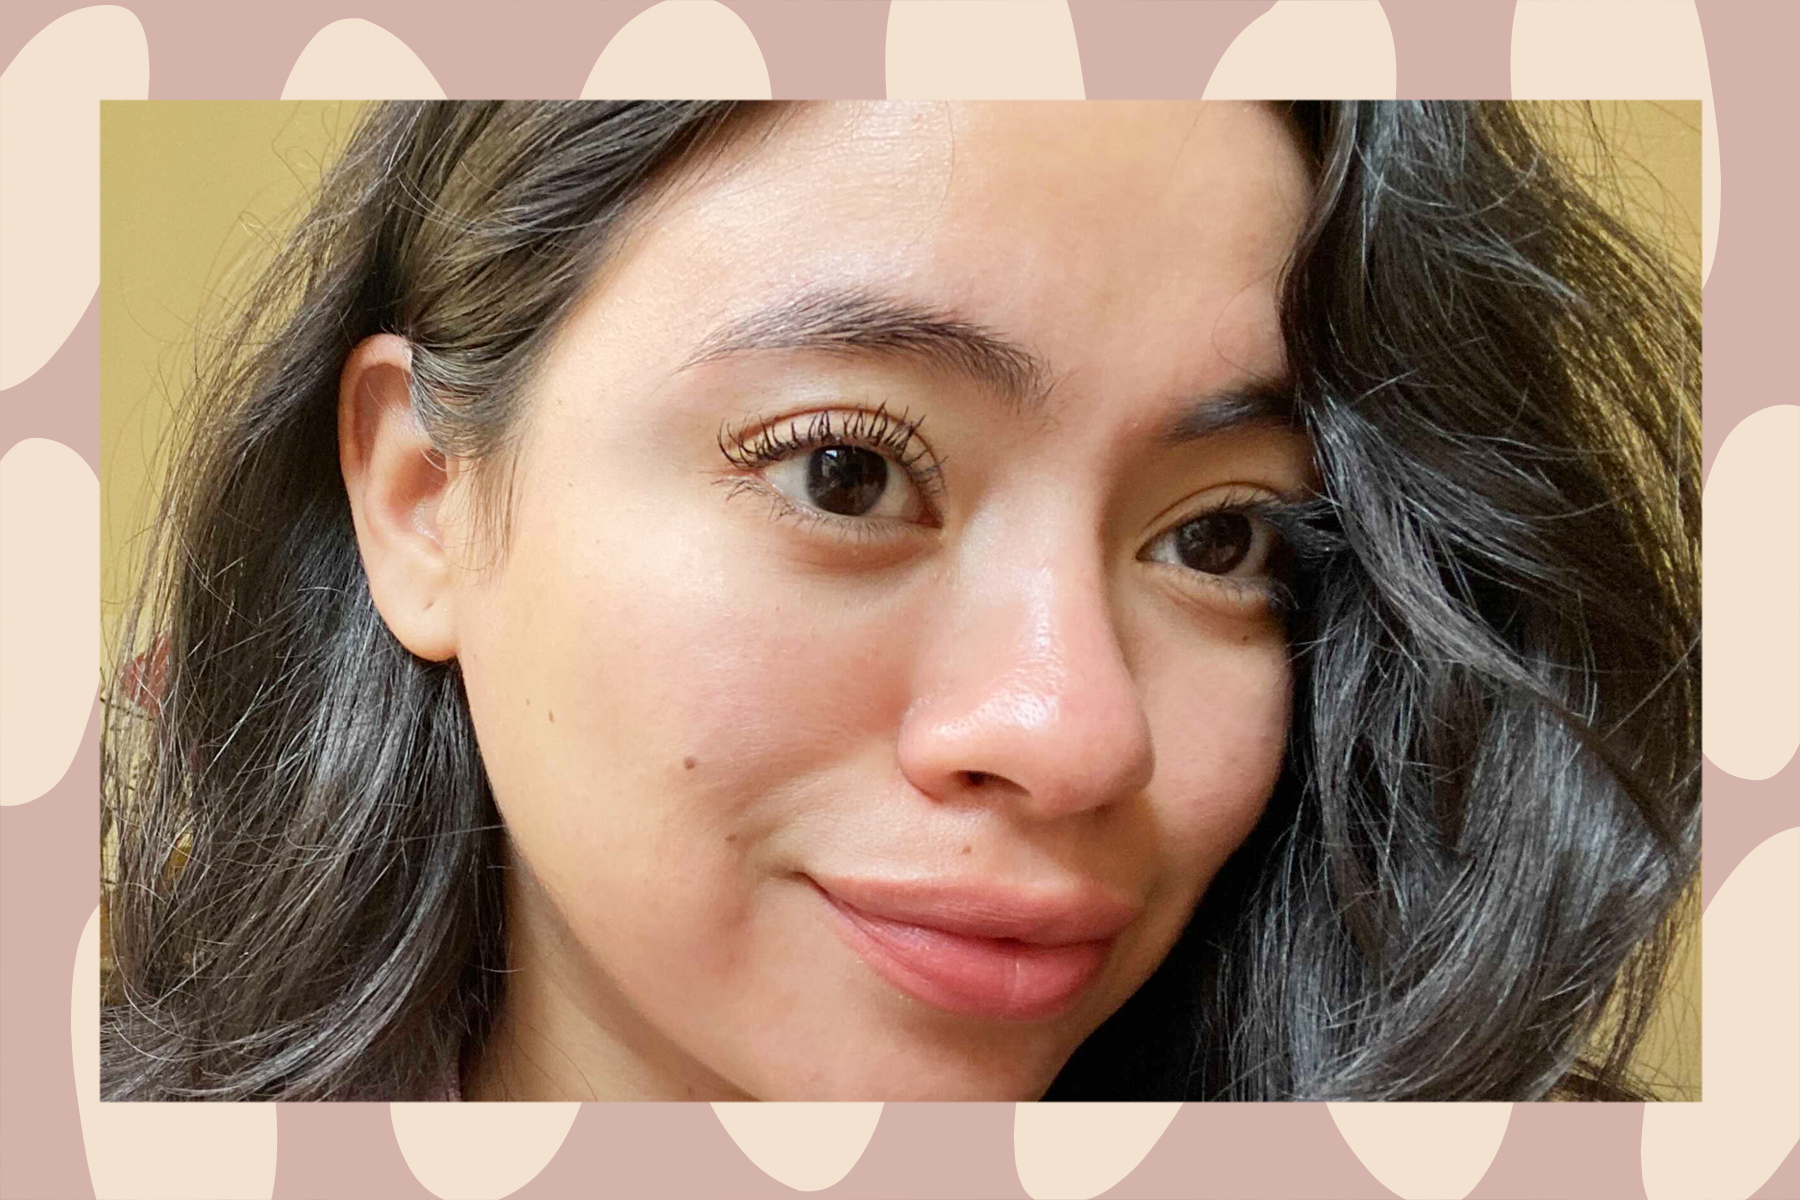 grande-cosmetics-lash-serum-review